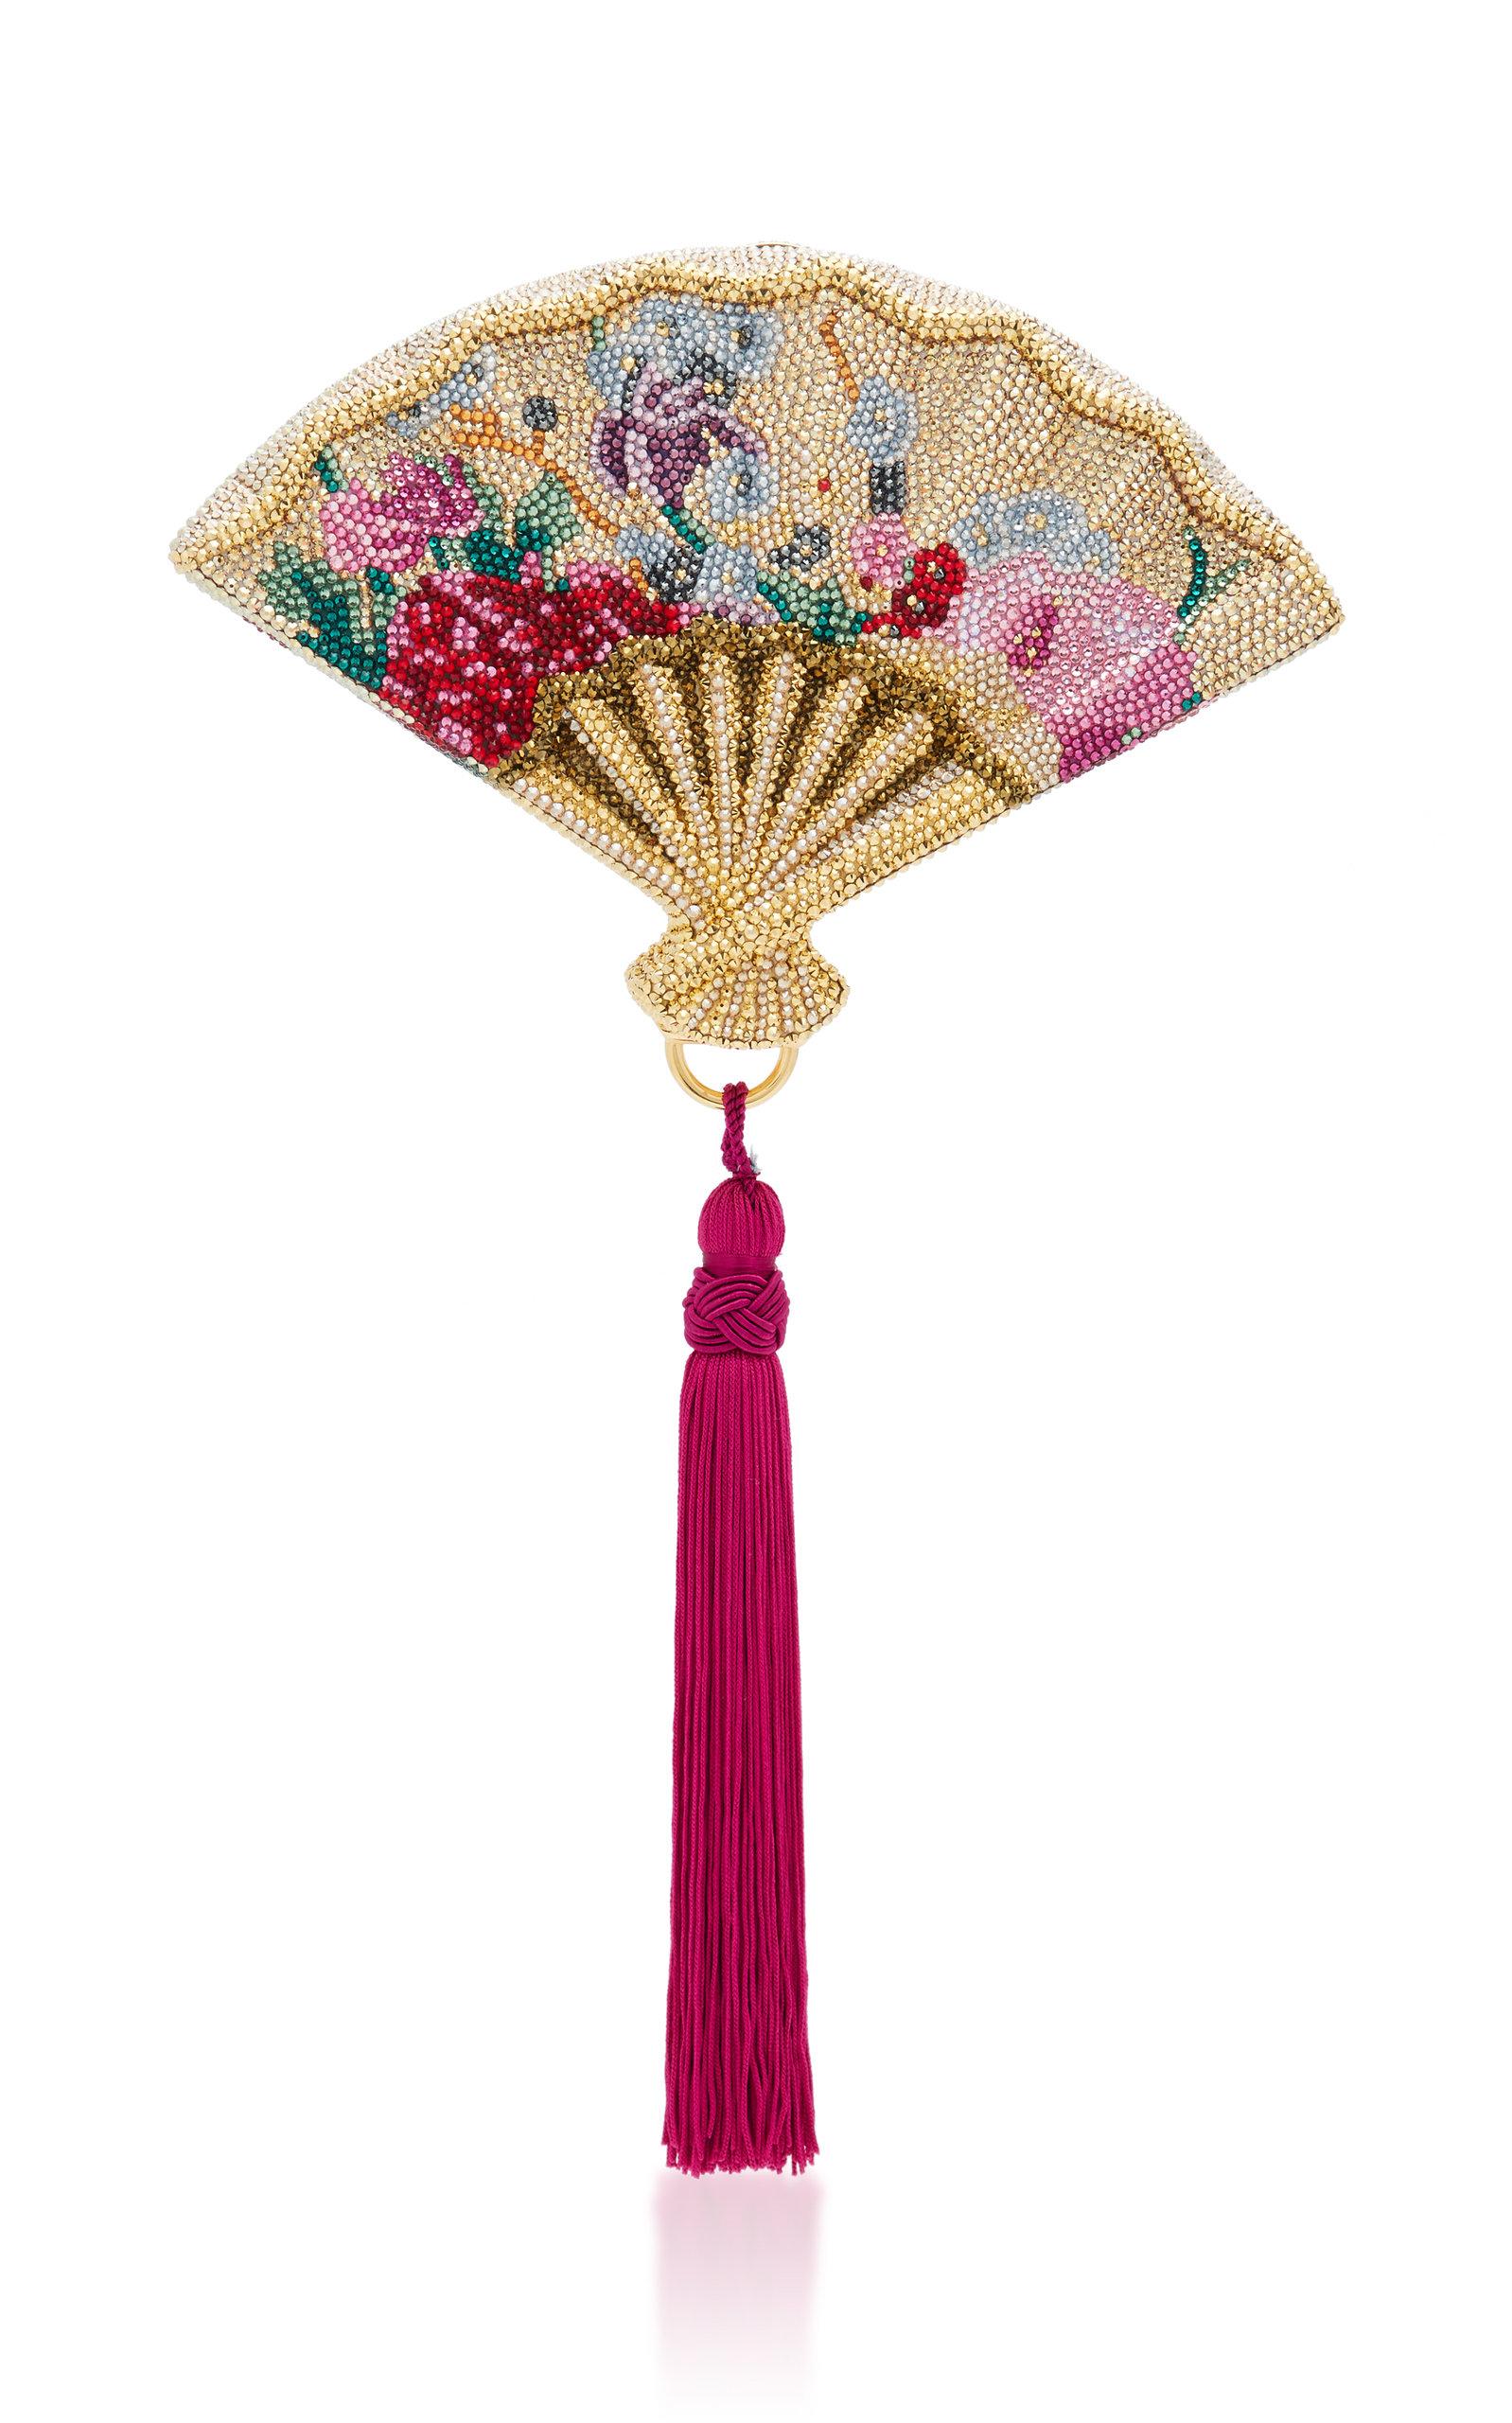 Gion Fan Clutch Judith Leiber 9ELel6gB